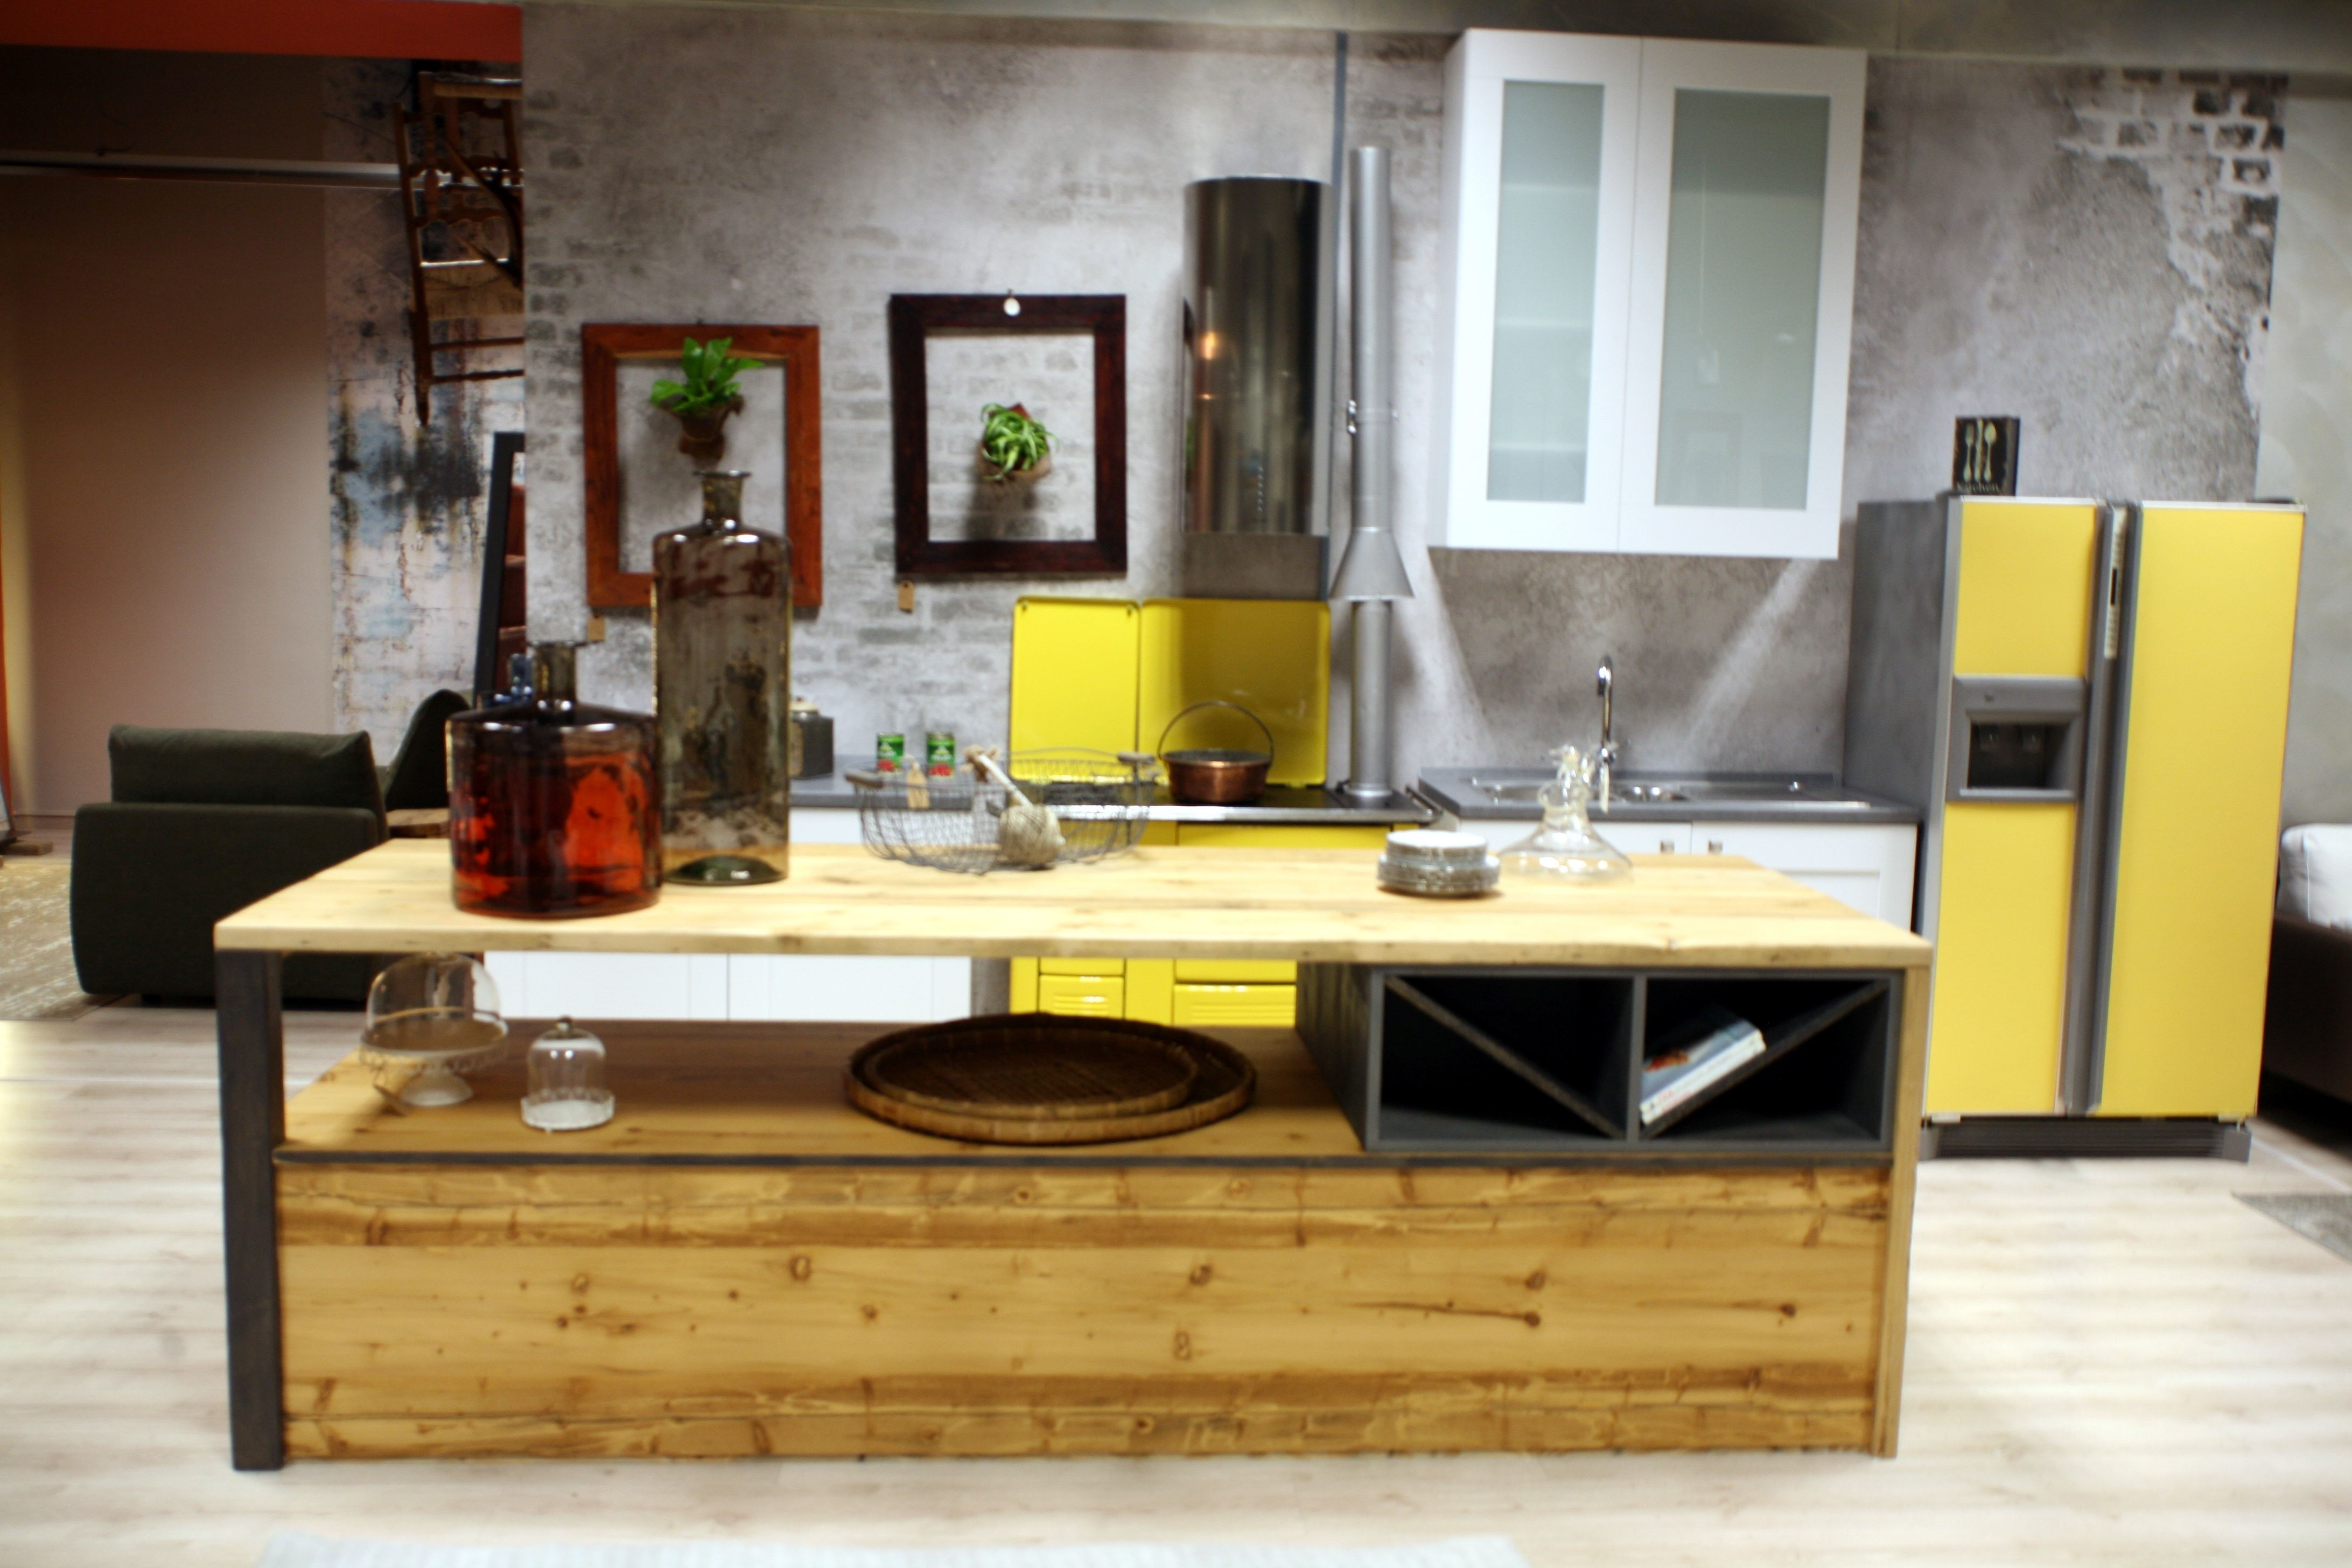 Modelli Cucina Cucine Isola Moderne Cucine In Muratura Con ...